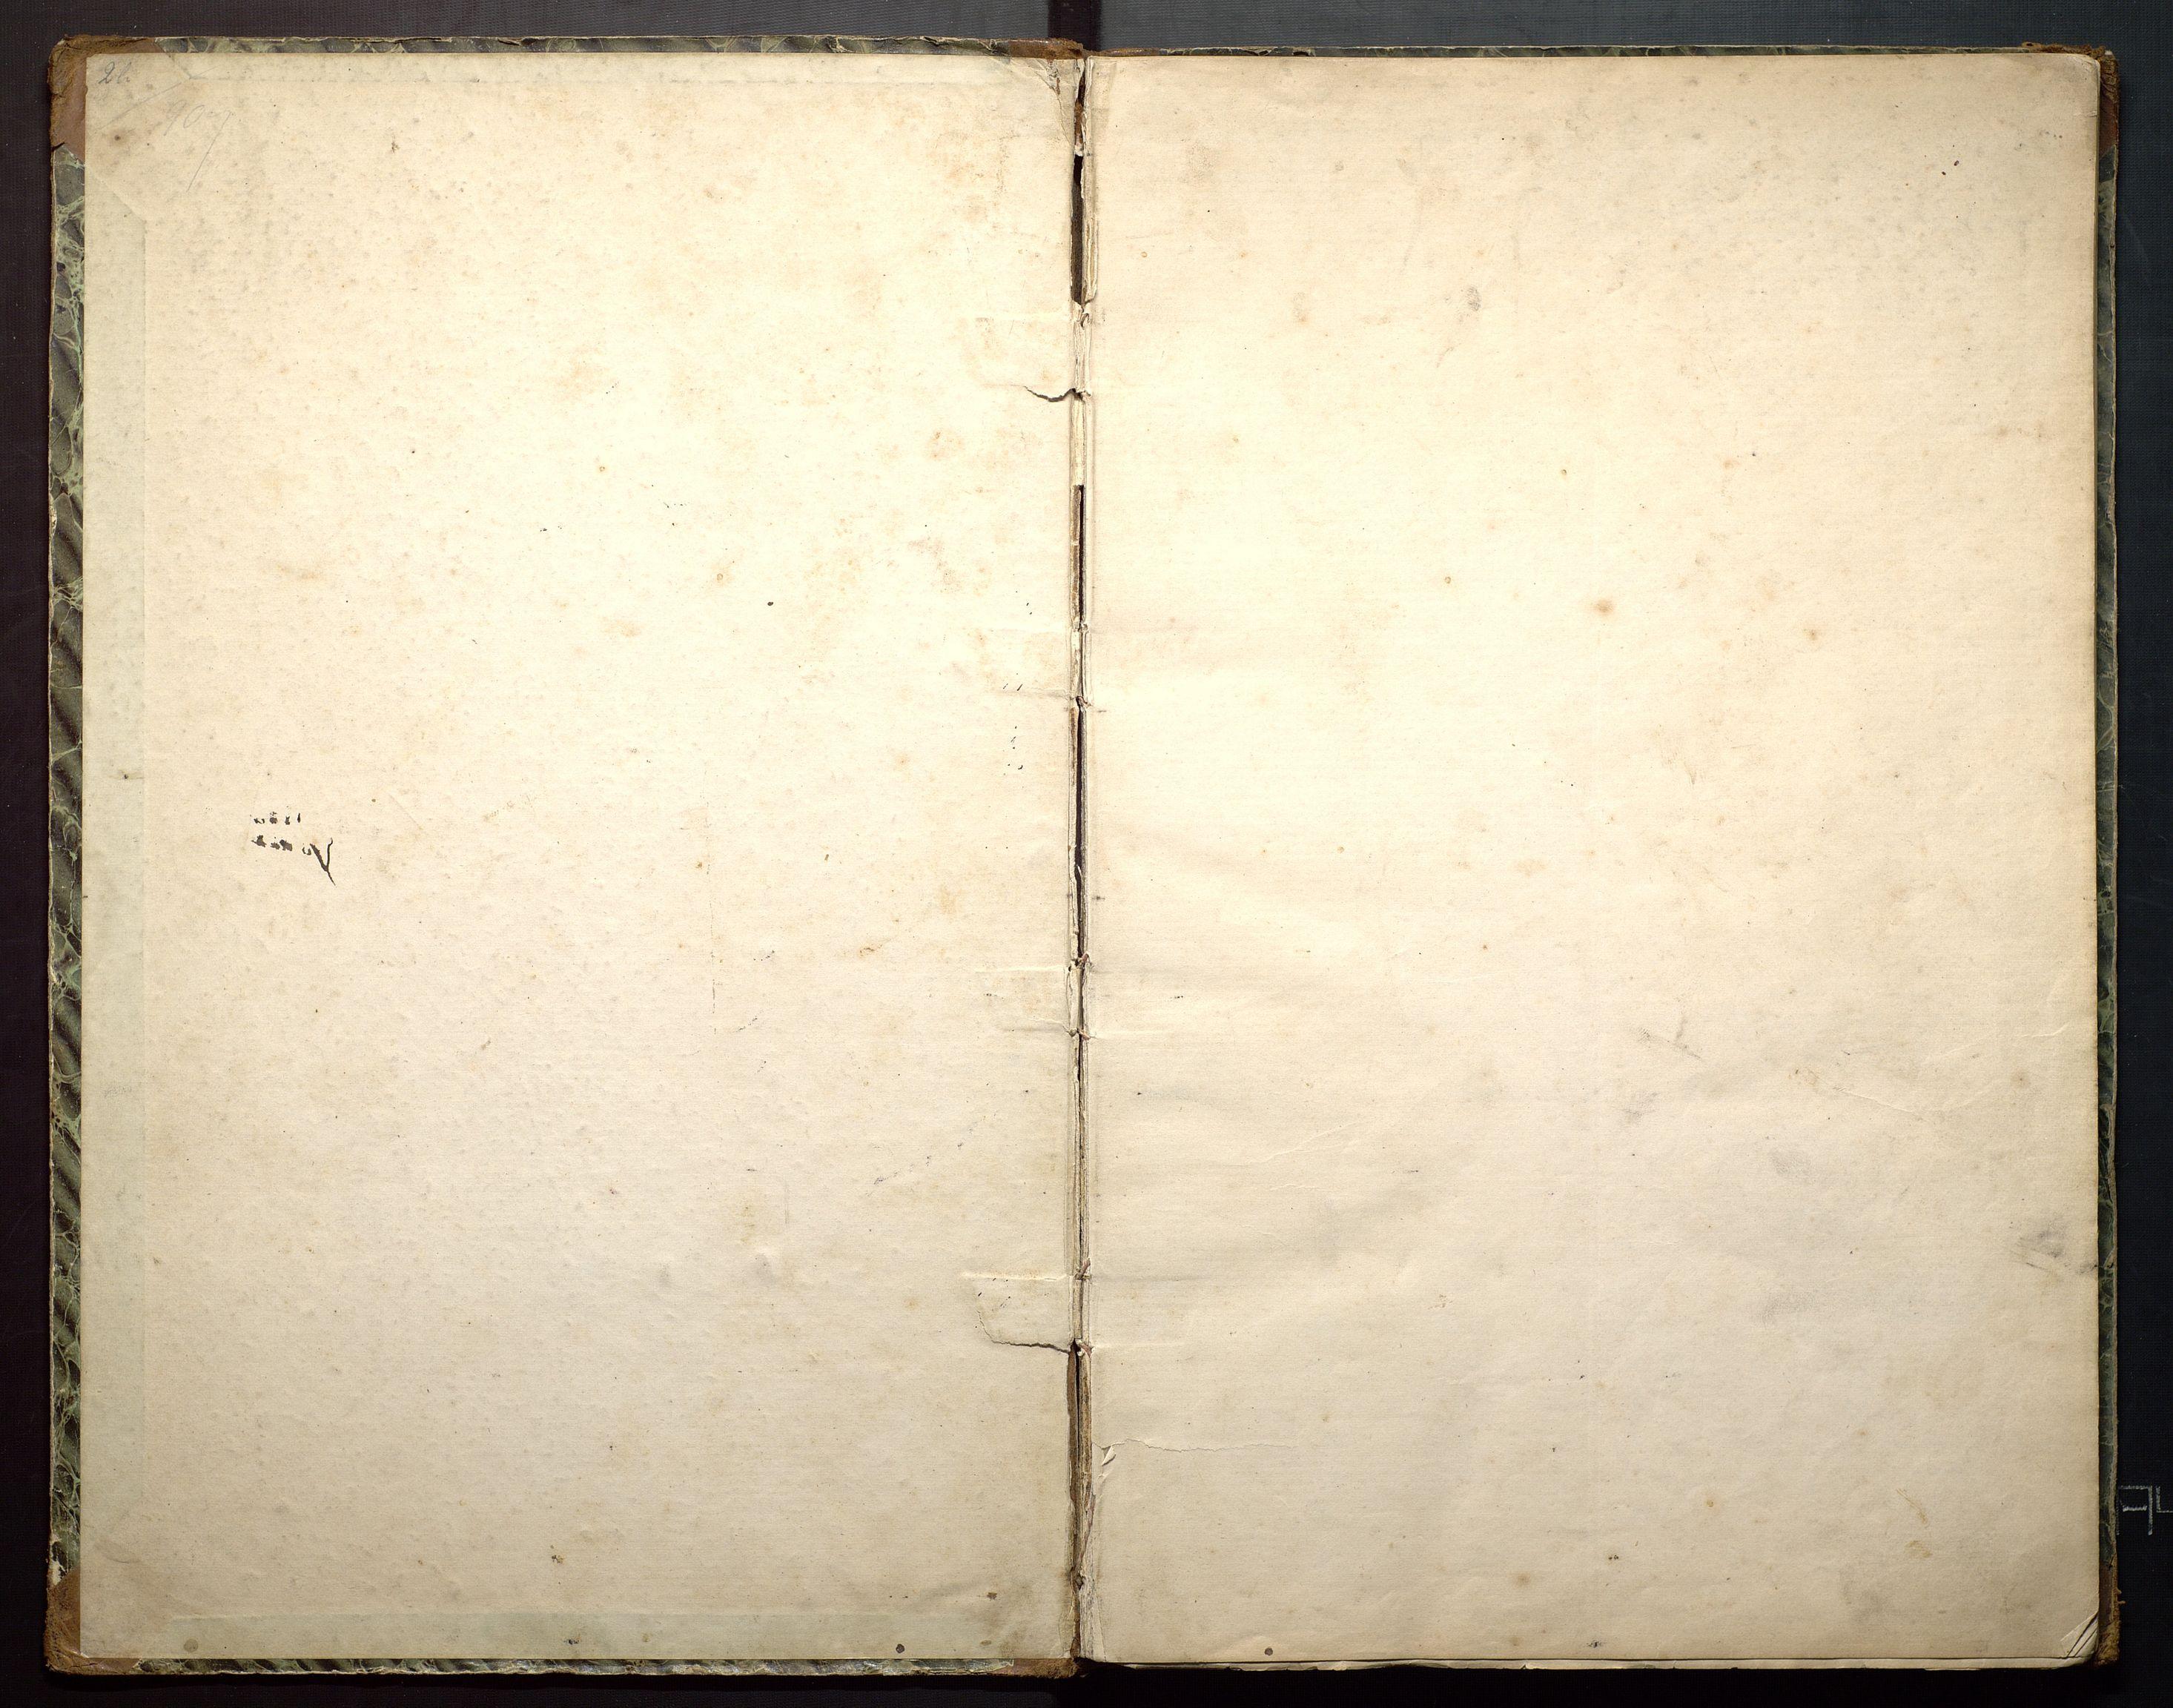 IKAH, Dampskipet DS Bjørnen, A/Aa/L0001: Styreprotokoll for DS Bjørnen, 1866-1891